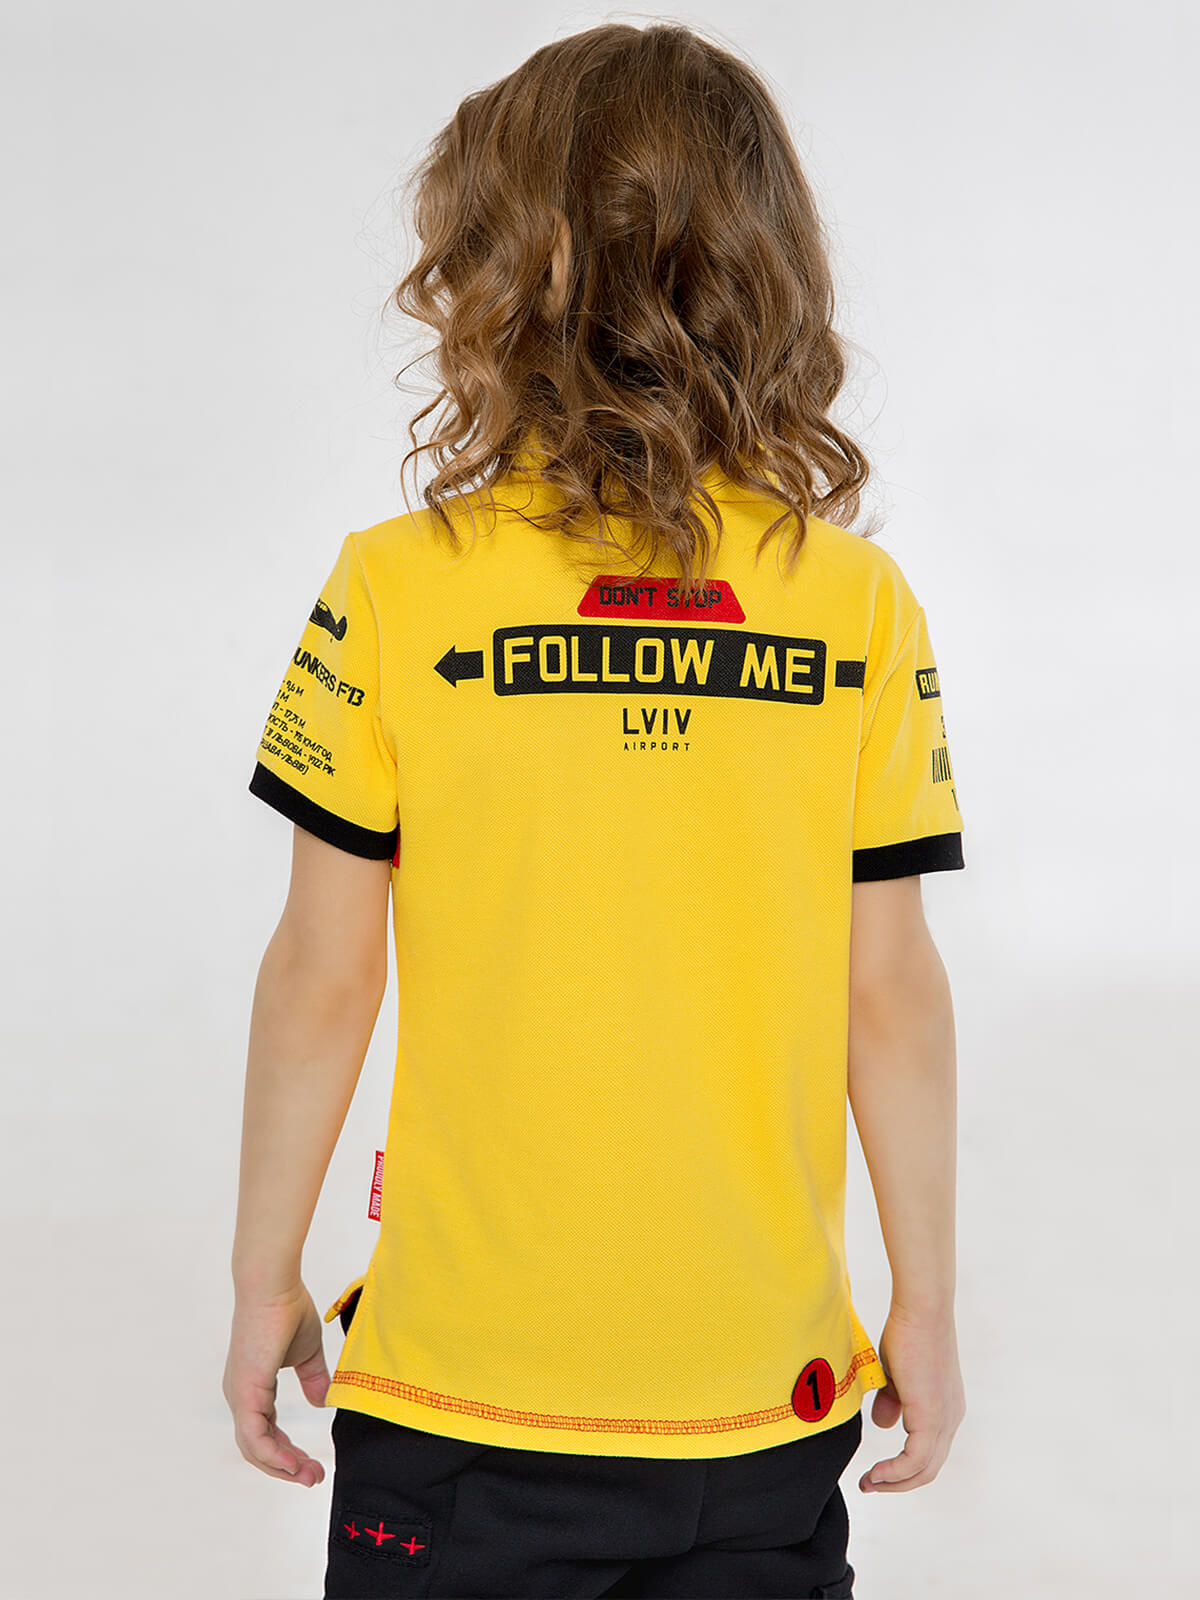 Kids Polo Shirt Follow Me. Color yellow. .